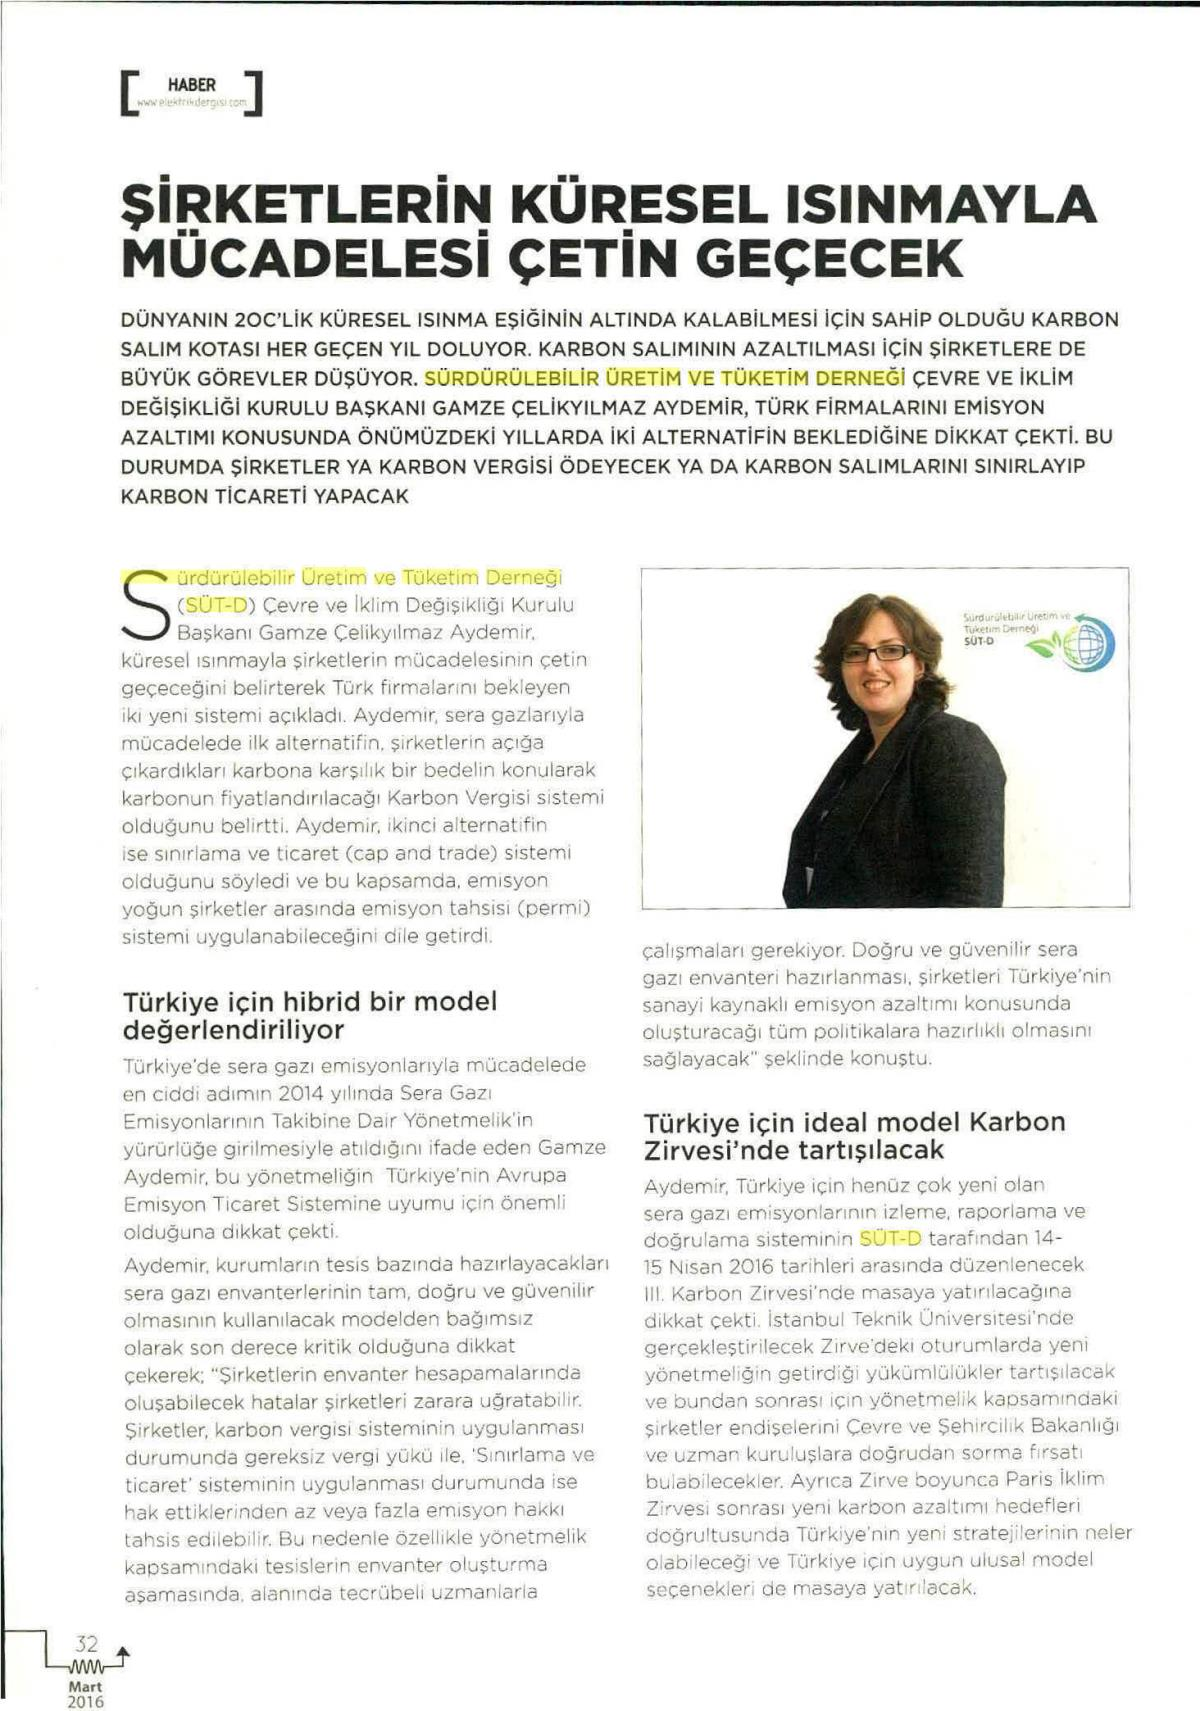 Kaynak Elektrik Dergisi 01.03.2016